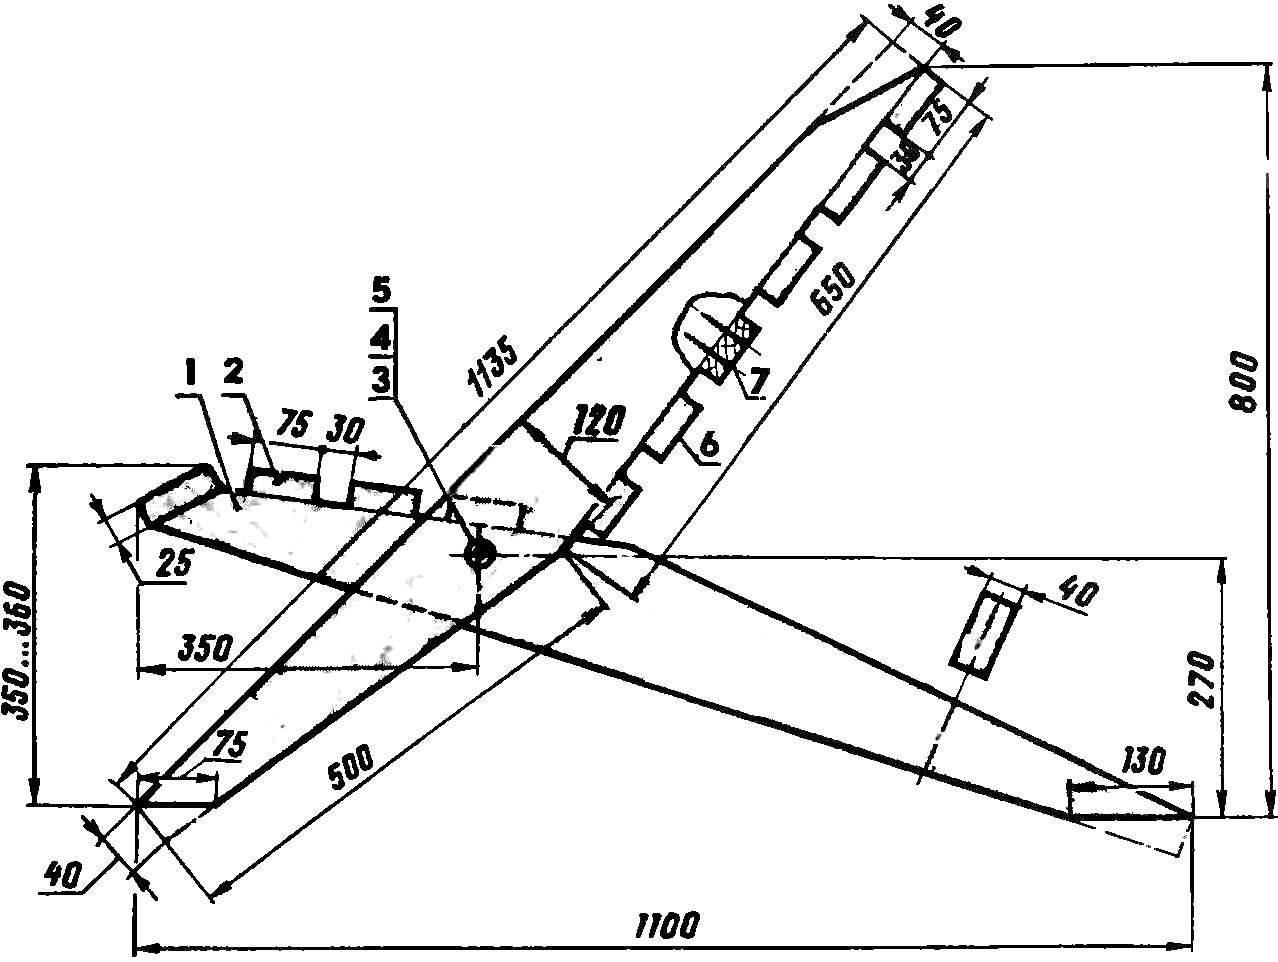 Chair-folding